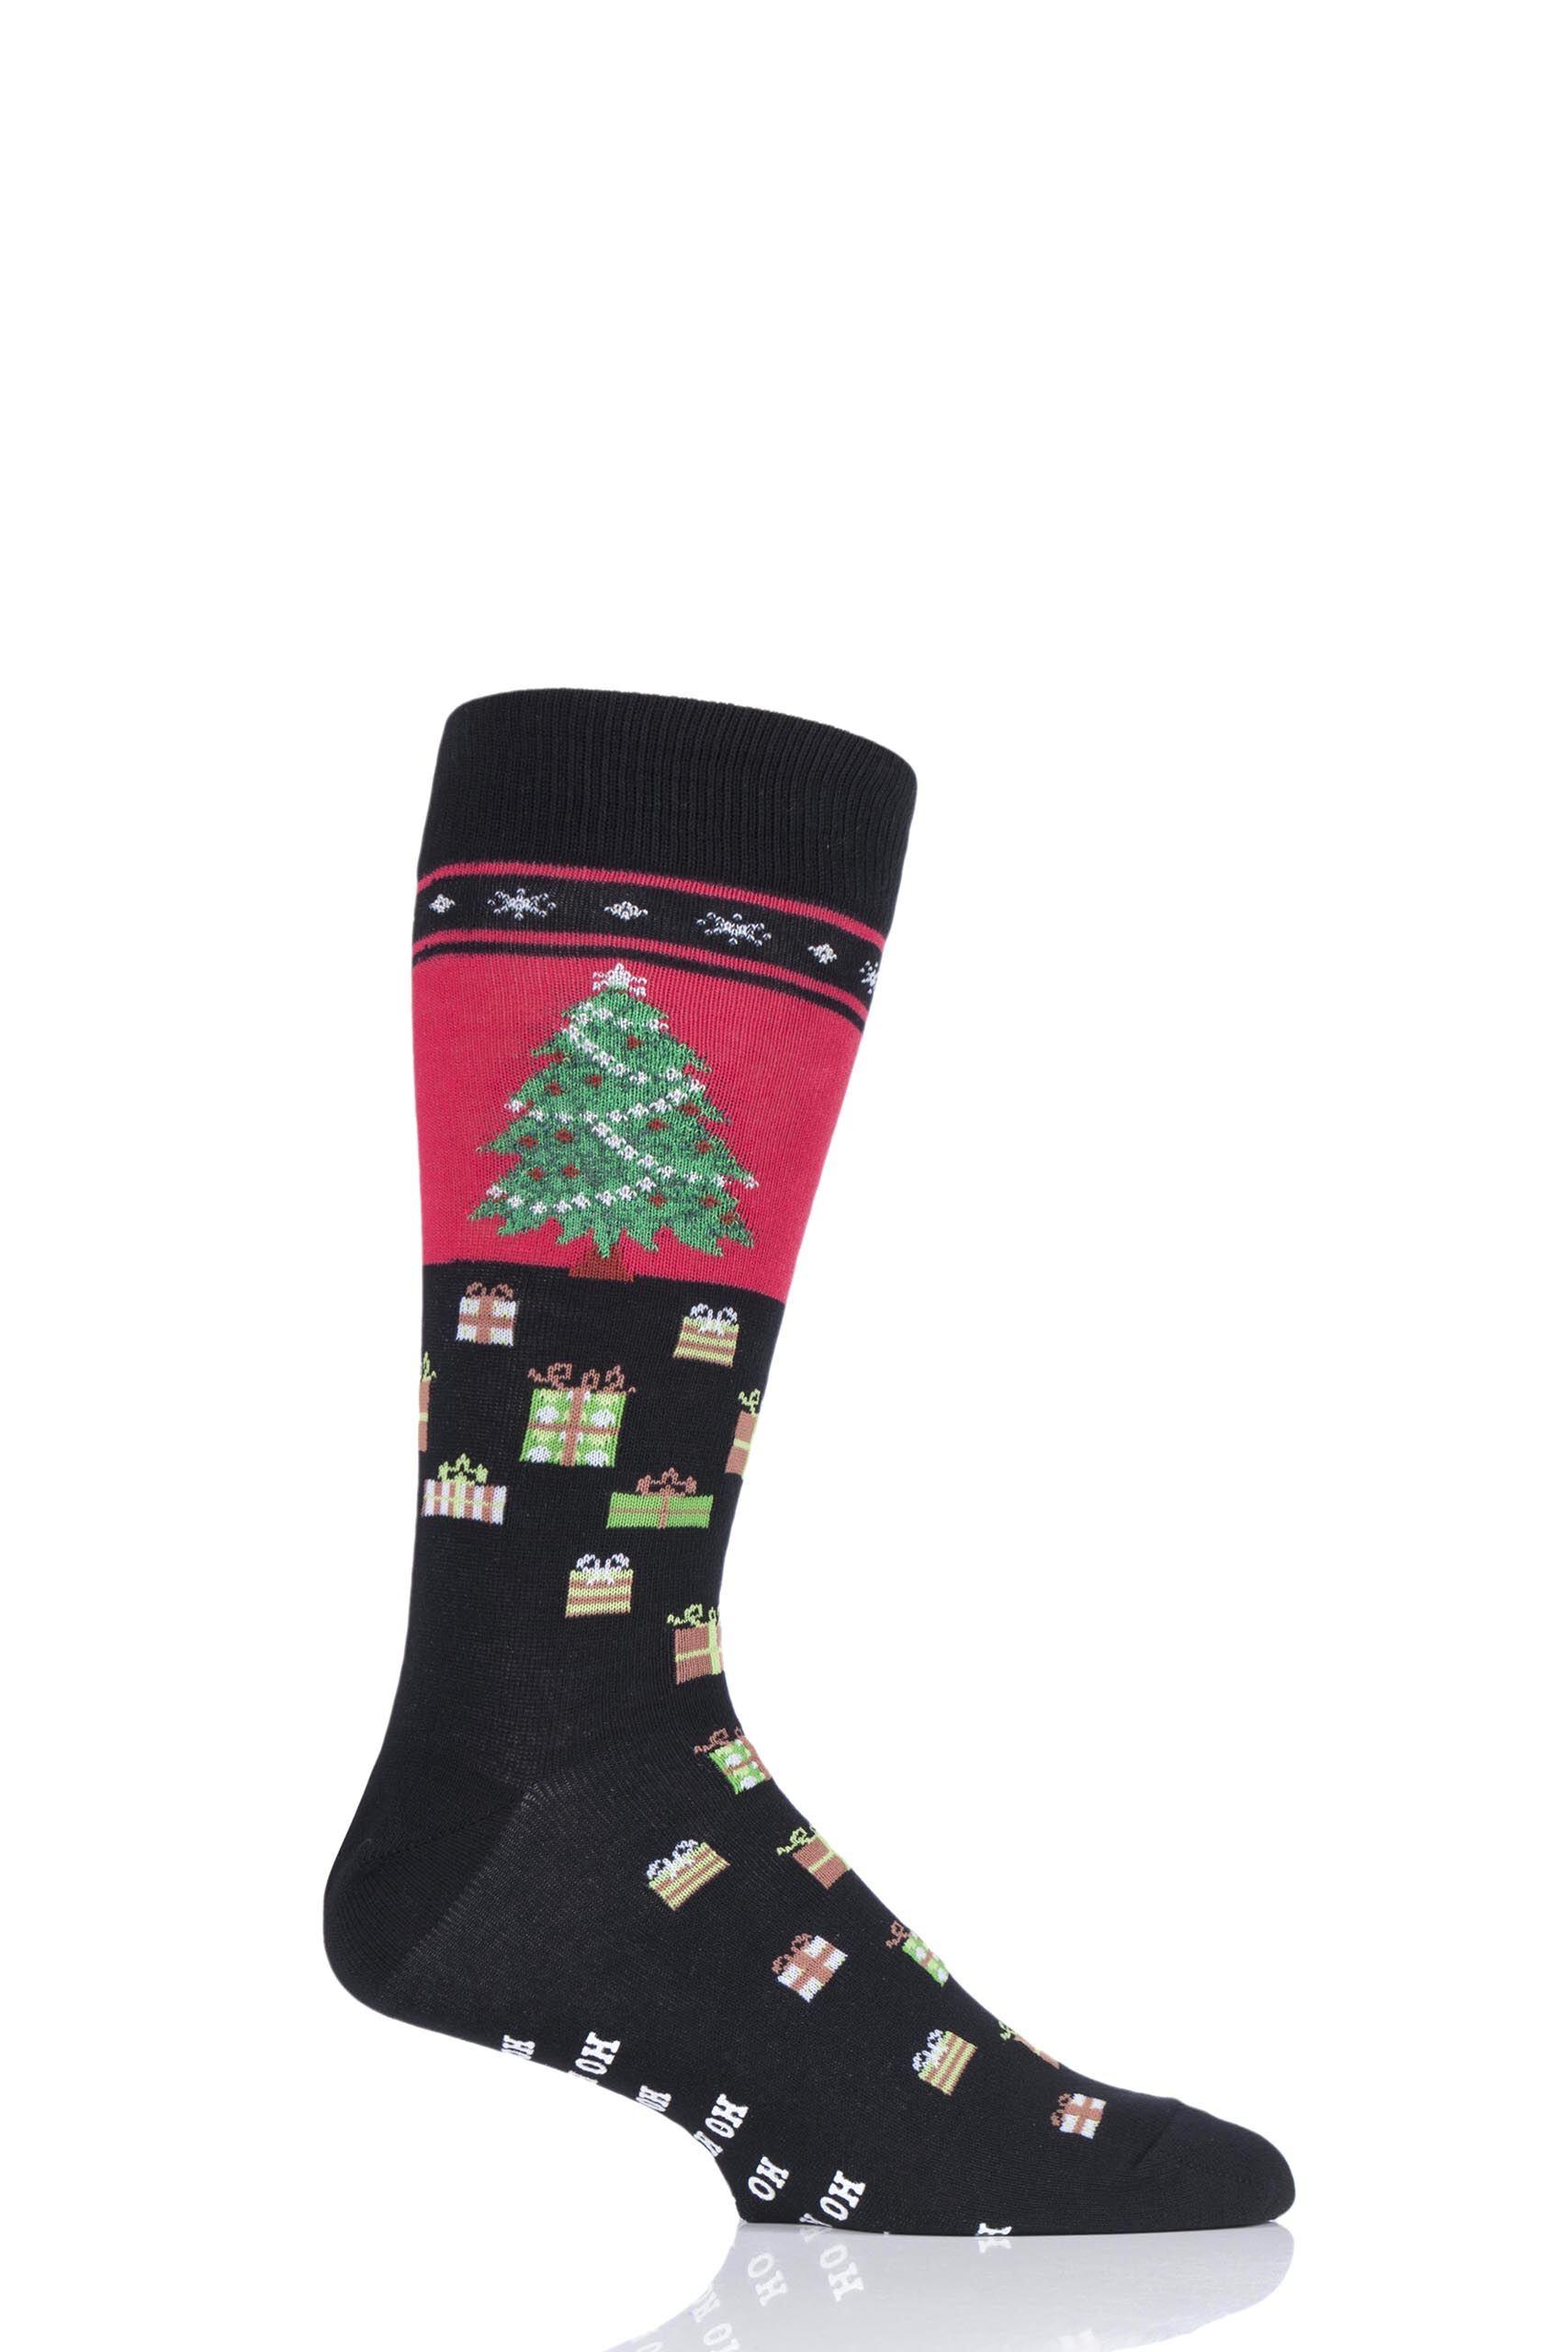 Image of 1 Pair Black HotSox Christmas Tree Cotton Socks Men's 8-12 Mens - Hot Sox